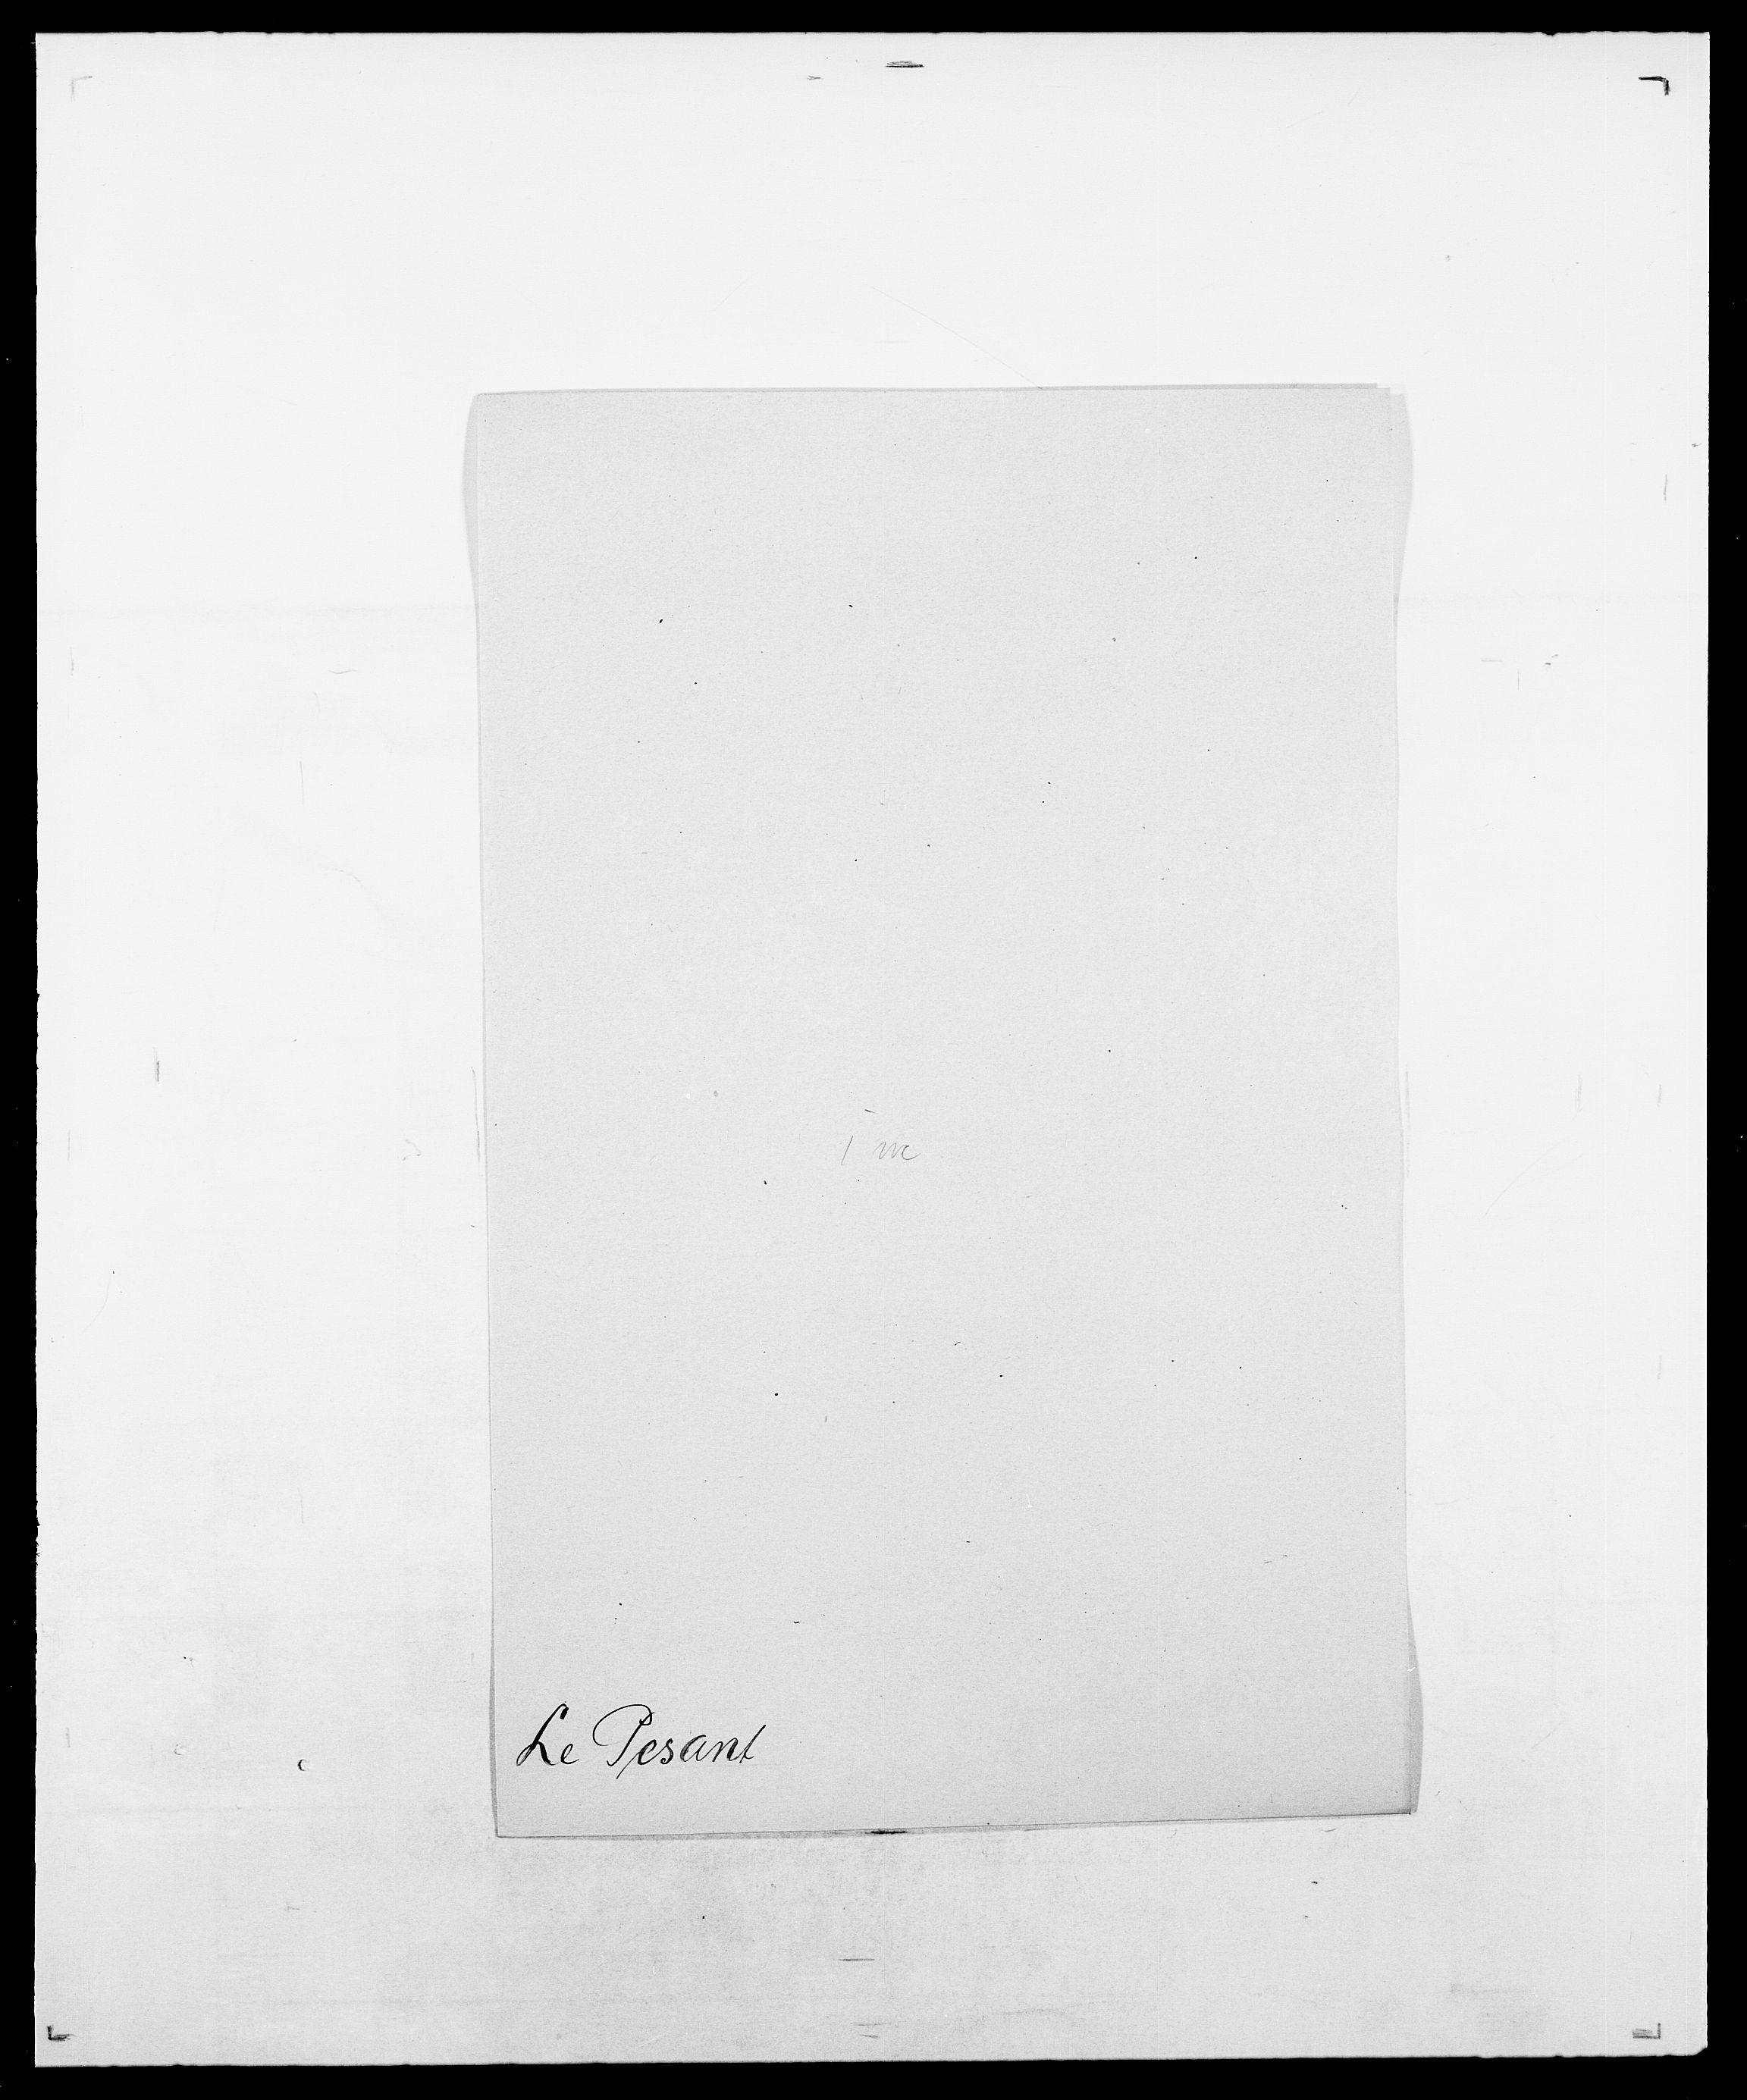 SAO, Delgobe, Charles Antoine - samling, D/Da/L0030: Paars - Pittelkov, s. 372